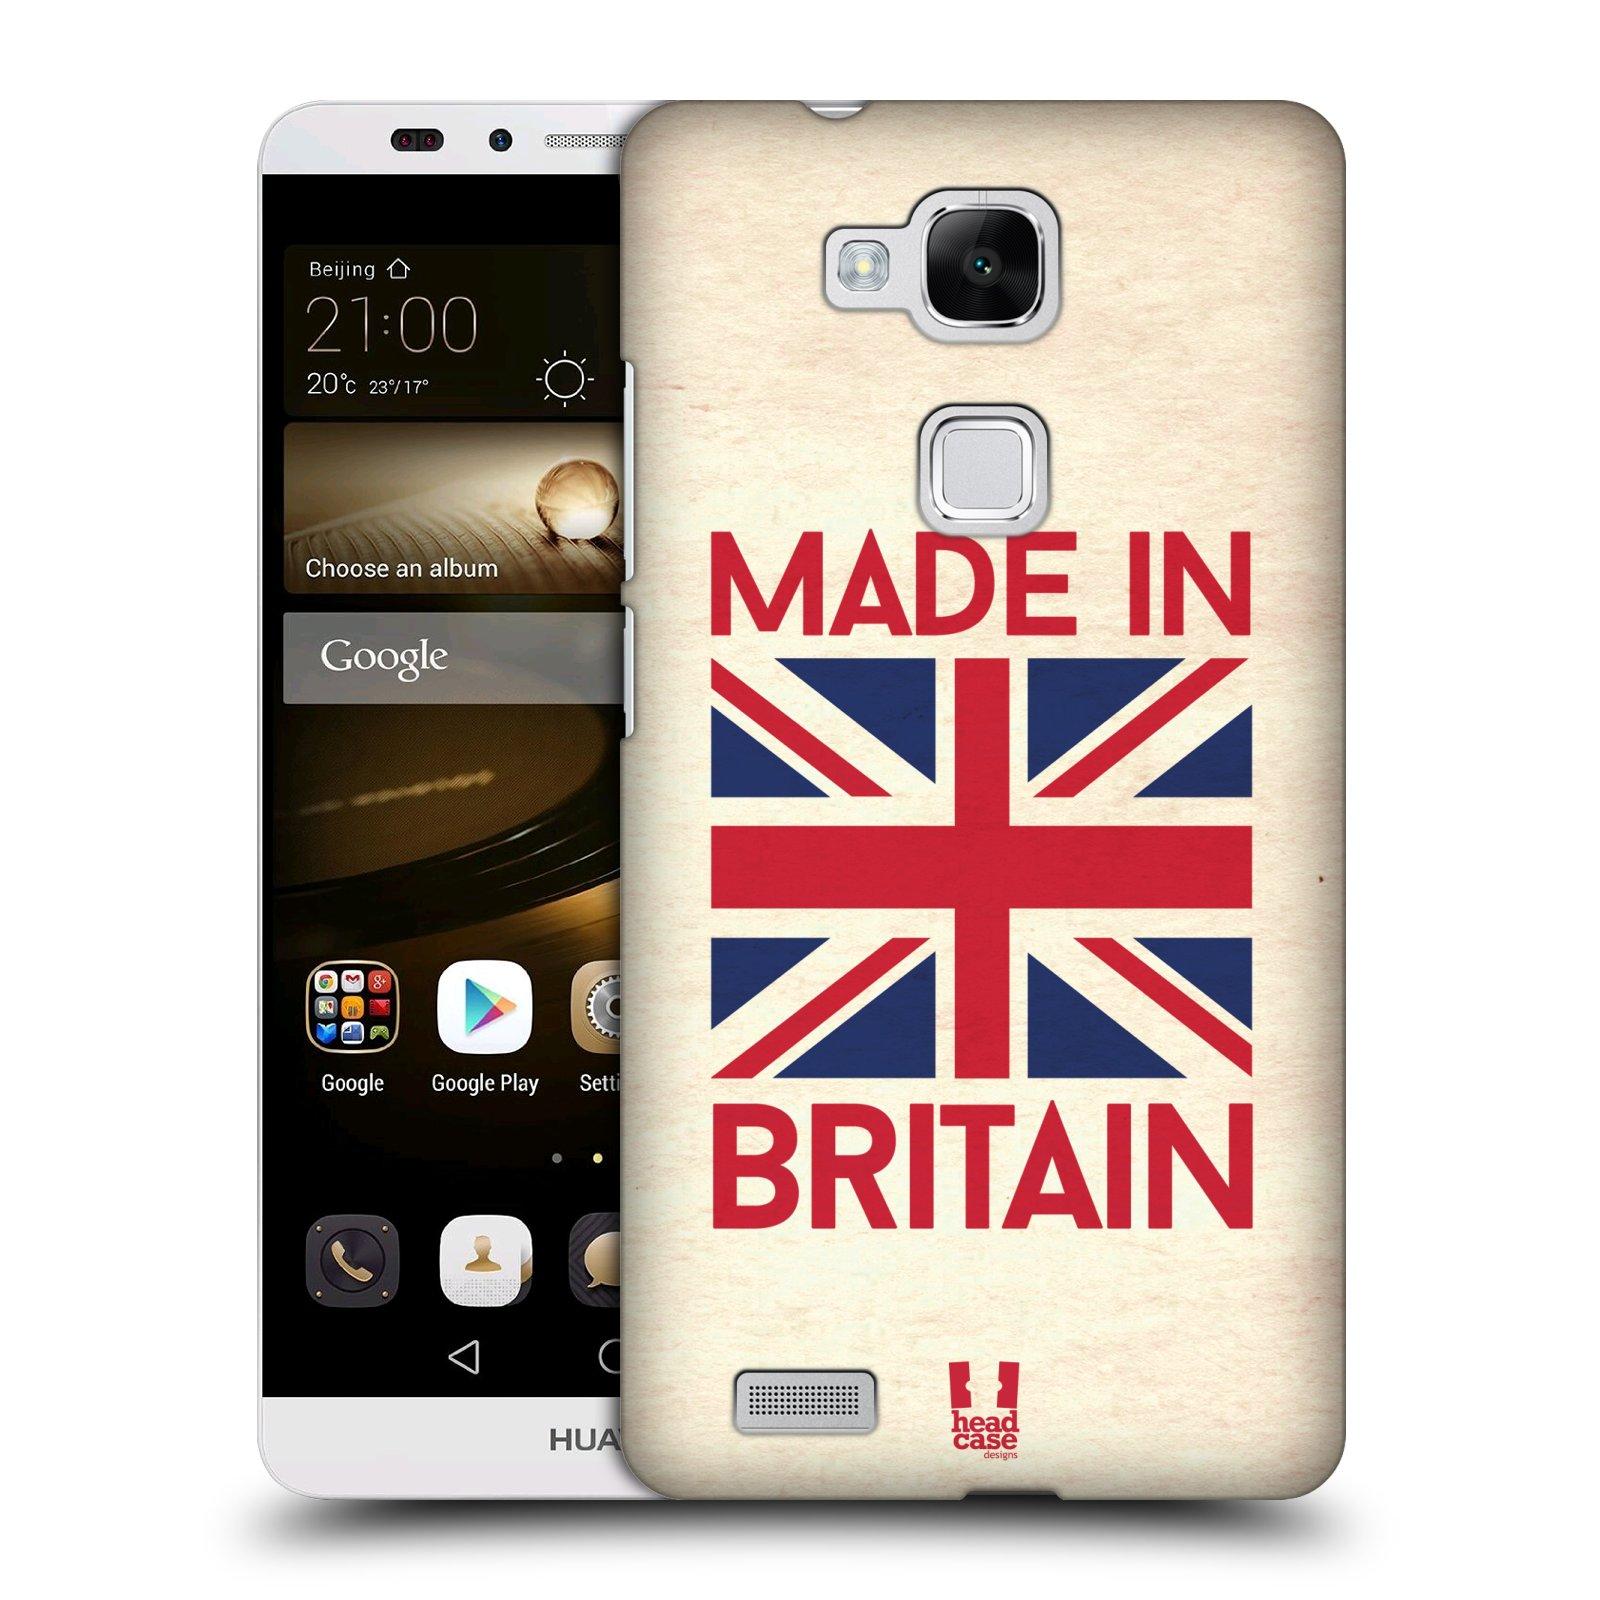 Plastové pouzdro na mobil Huawei Ascend Mate 7 HEAD CASE MADE IN BRITAIN (Kryt či obal na mobilní telefon Huawei Ascend Mate7)